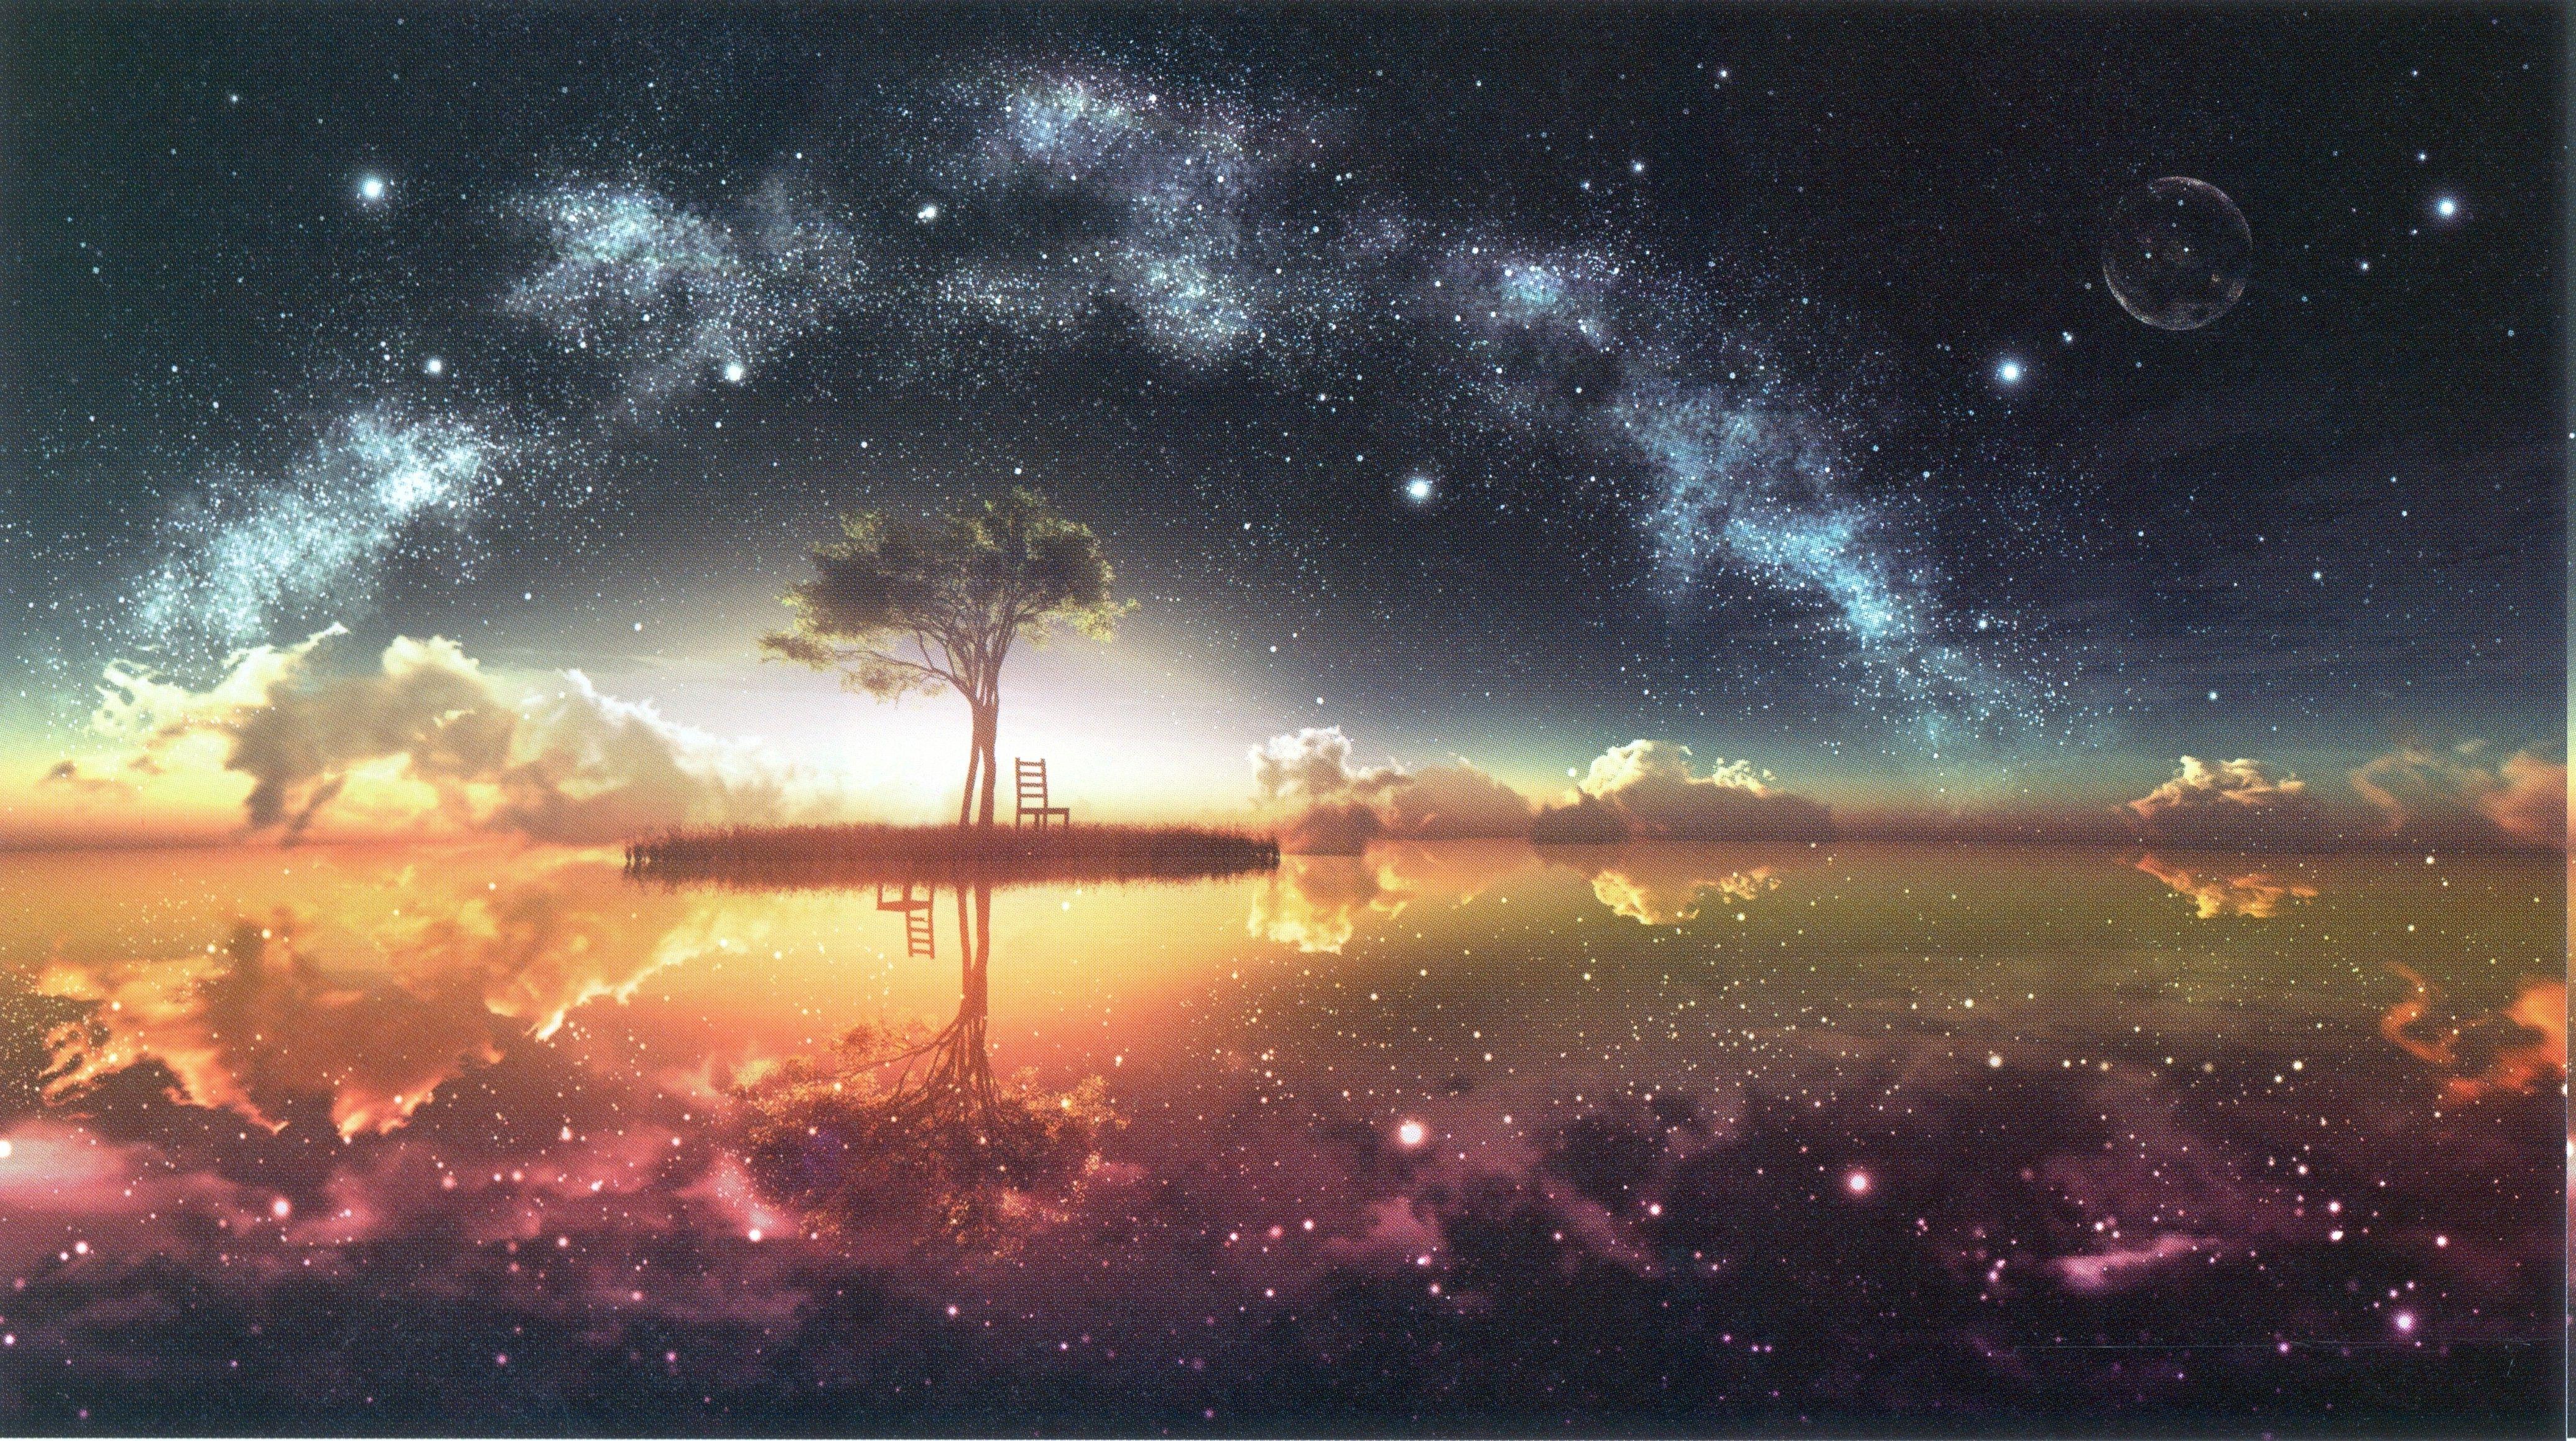 4142x2317 Beautiful Anime Scenery Wallpaper Hd Anime Wp Scenery Wallpaper Landscape Wallpaper Landscape Background